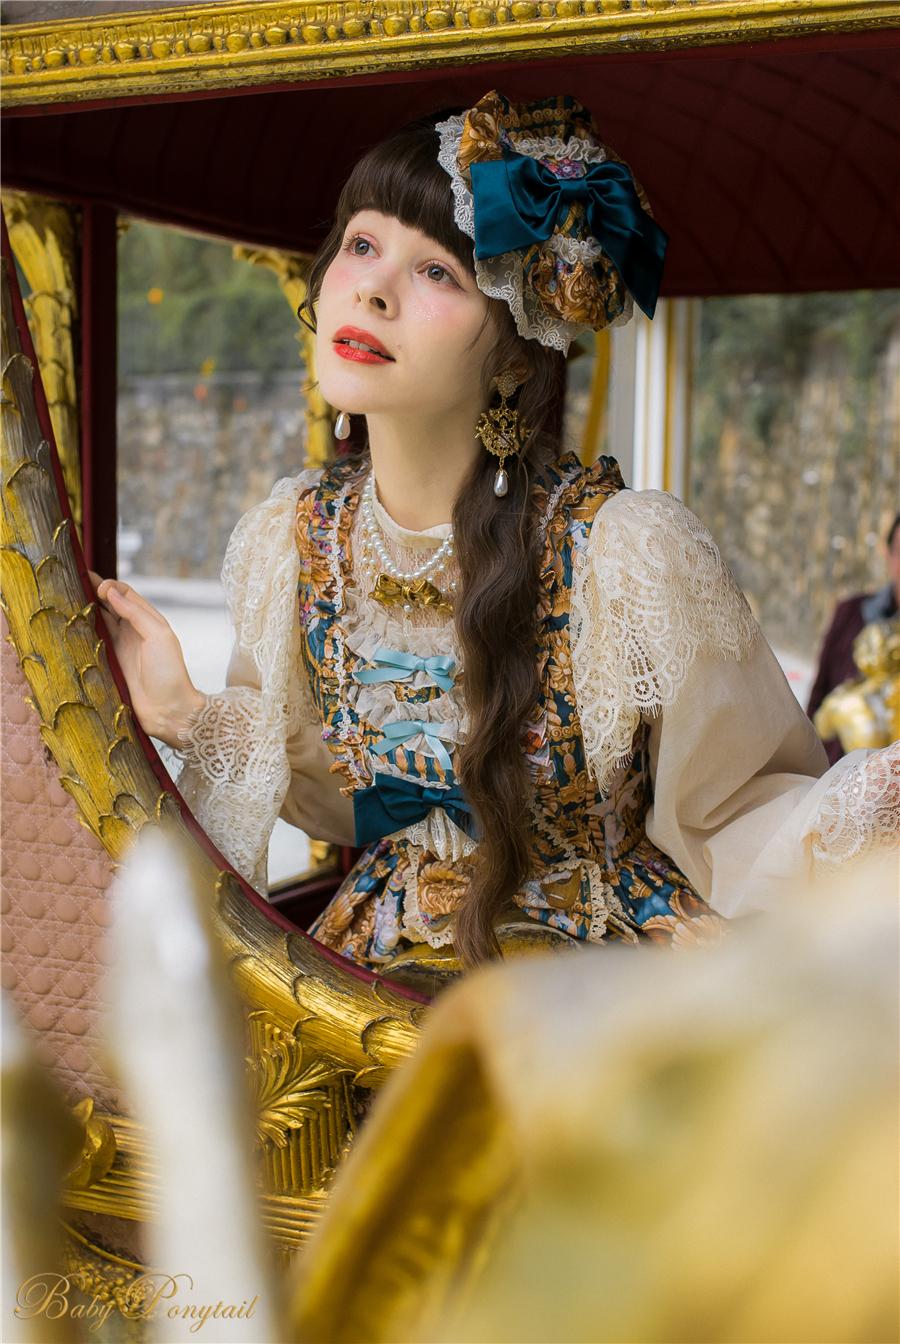 Babyponytail_Model_JSK_Tiel Present Angel_Claudia_2_09.jpg